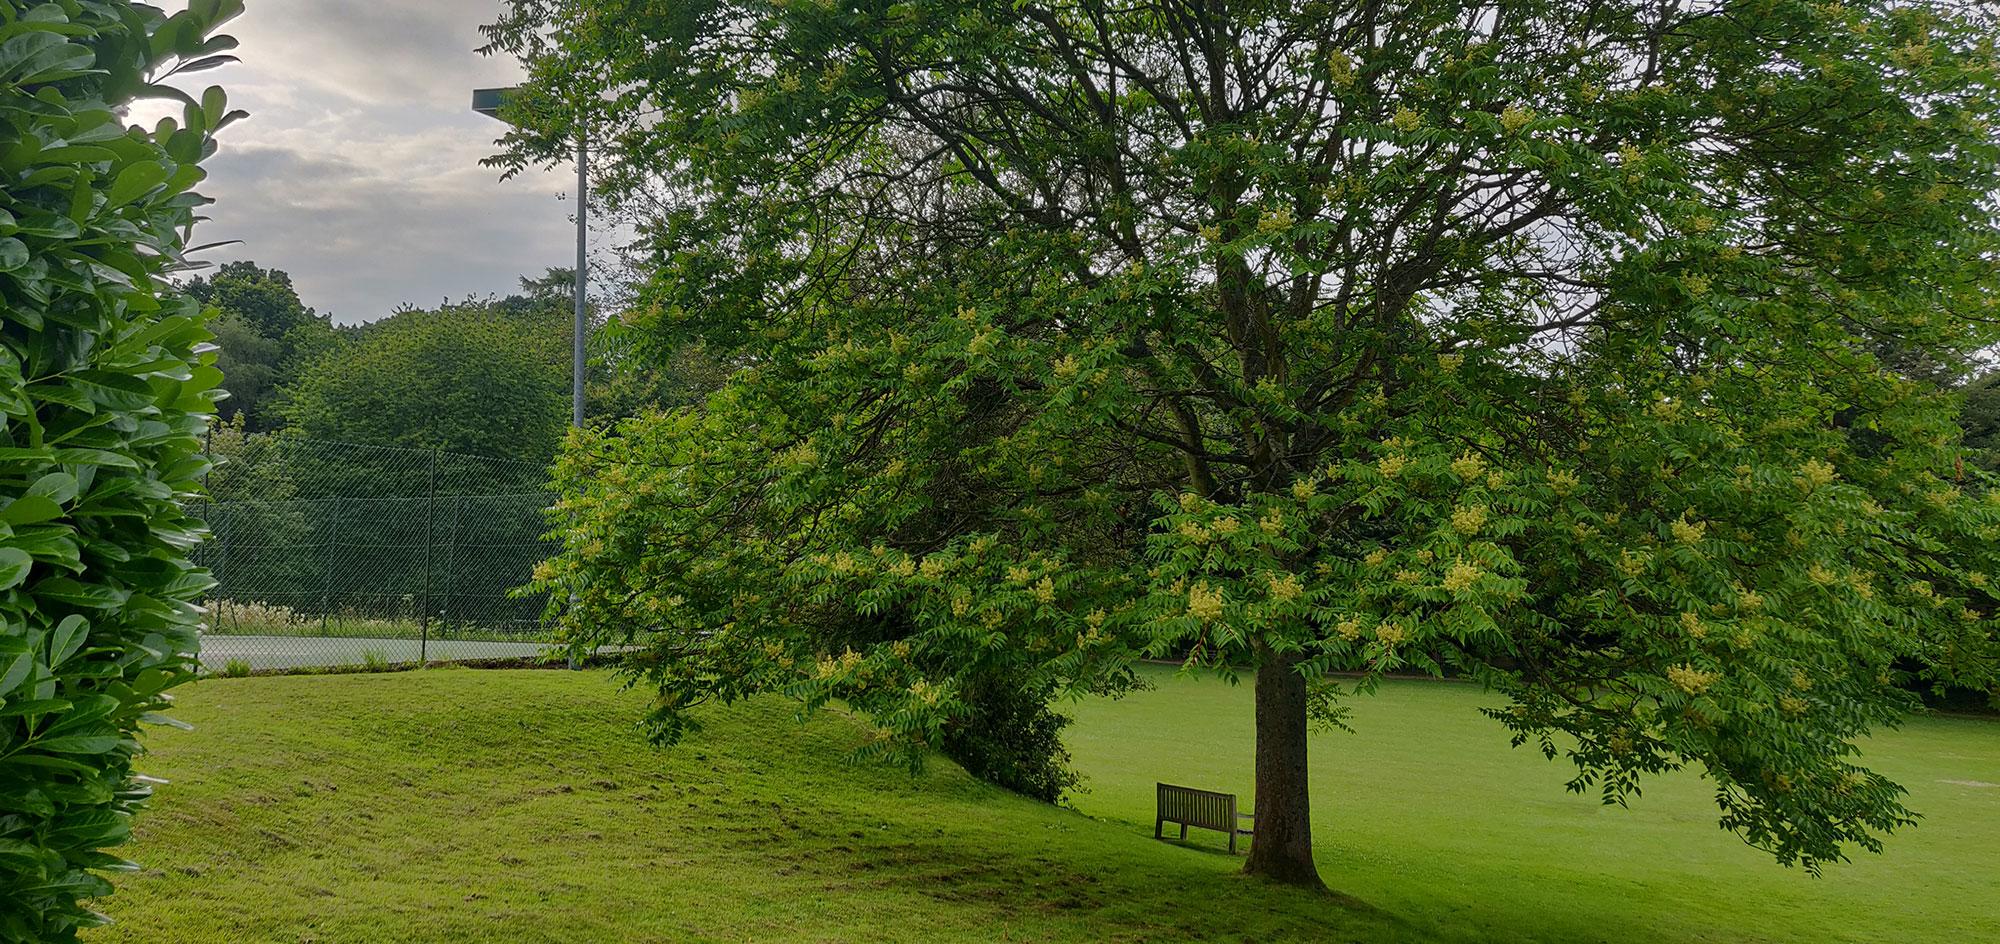 Ightham recreation ground